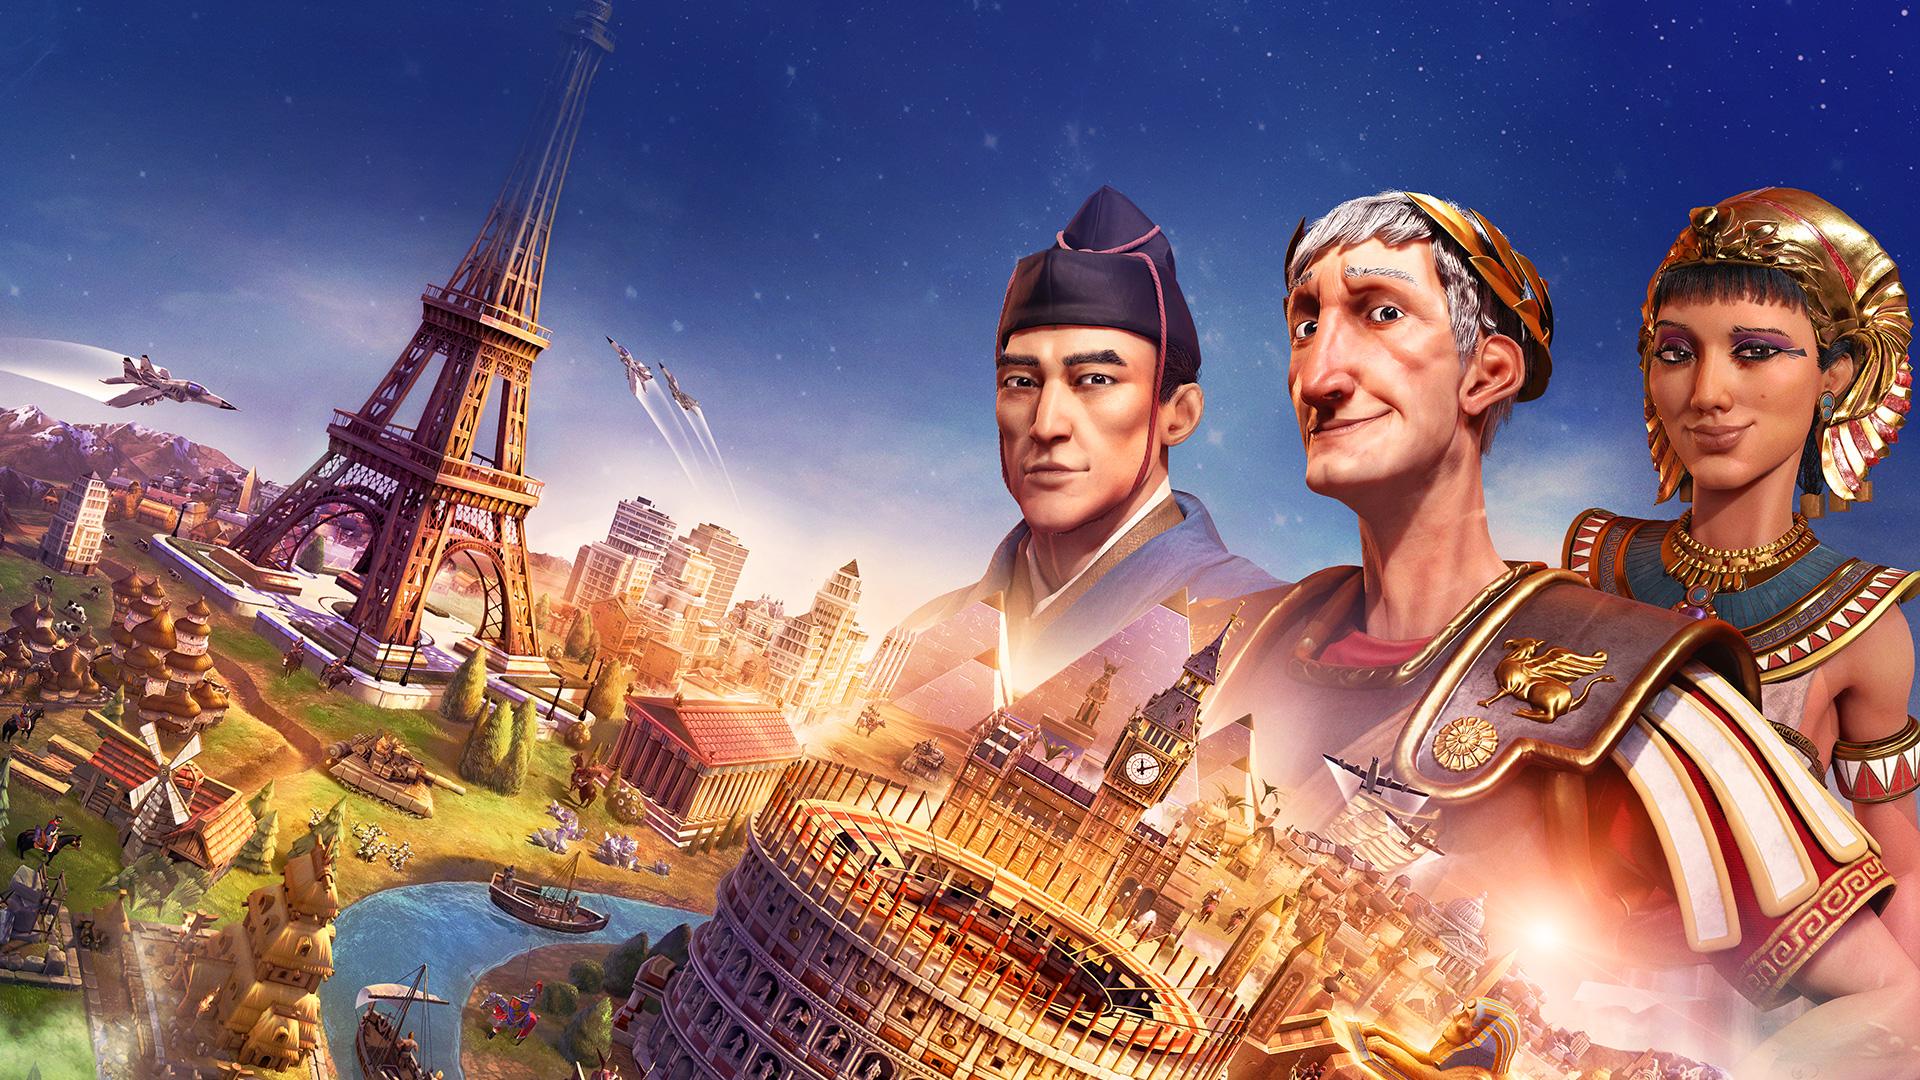 Oznámena strategie Civilization VI pro Xbox One a Playstation 4